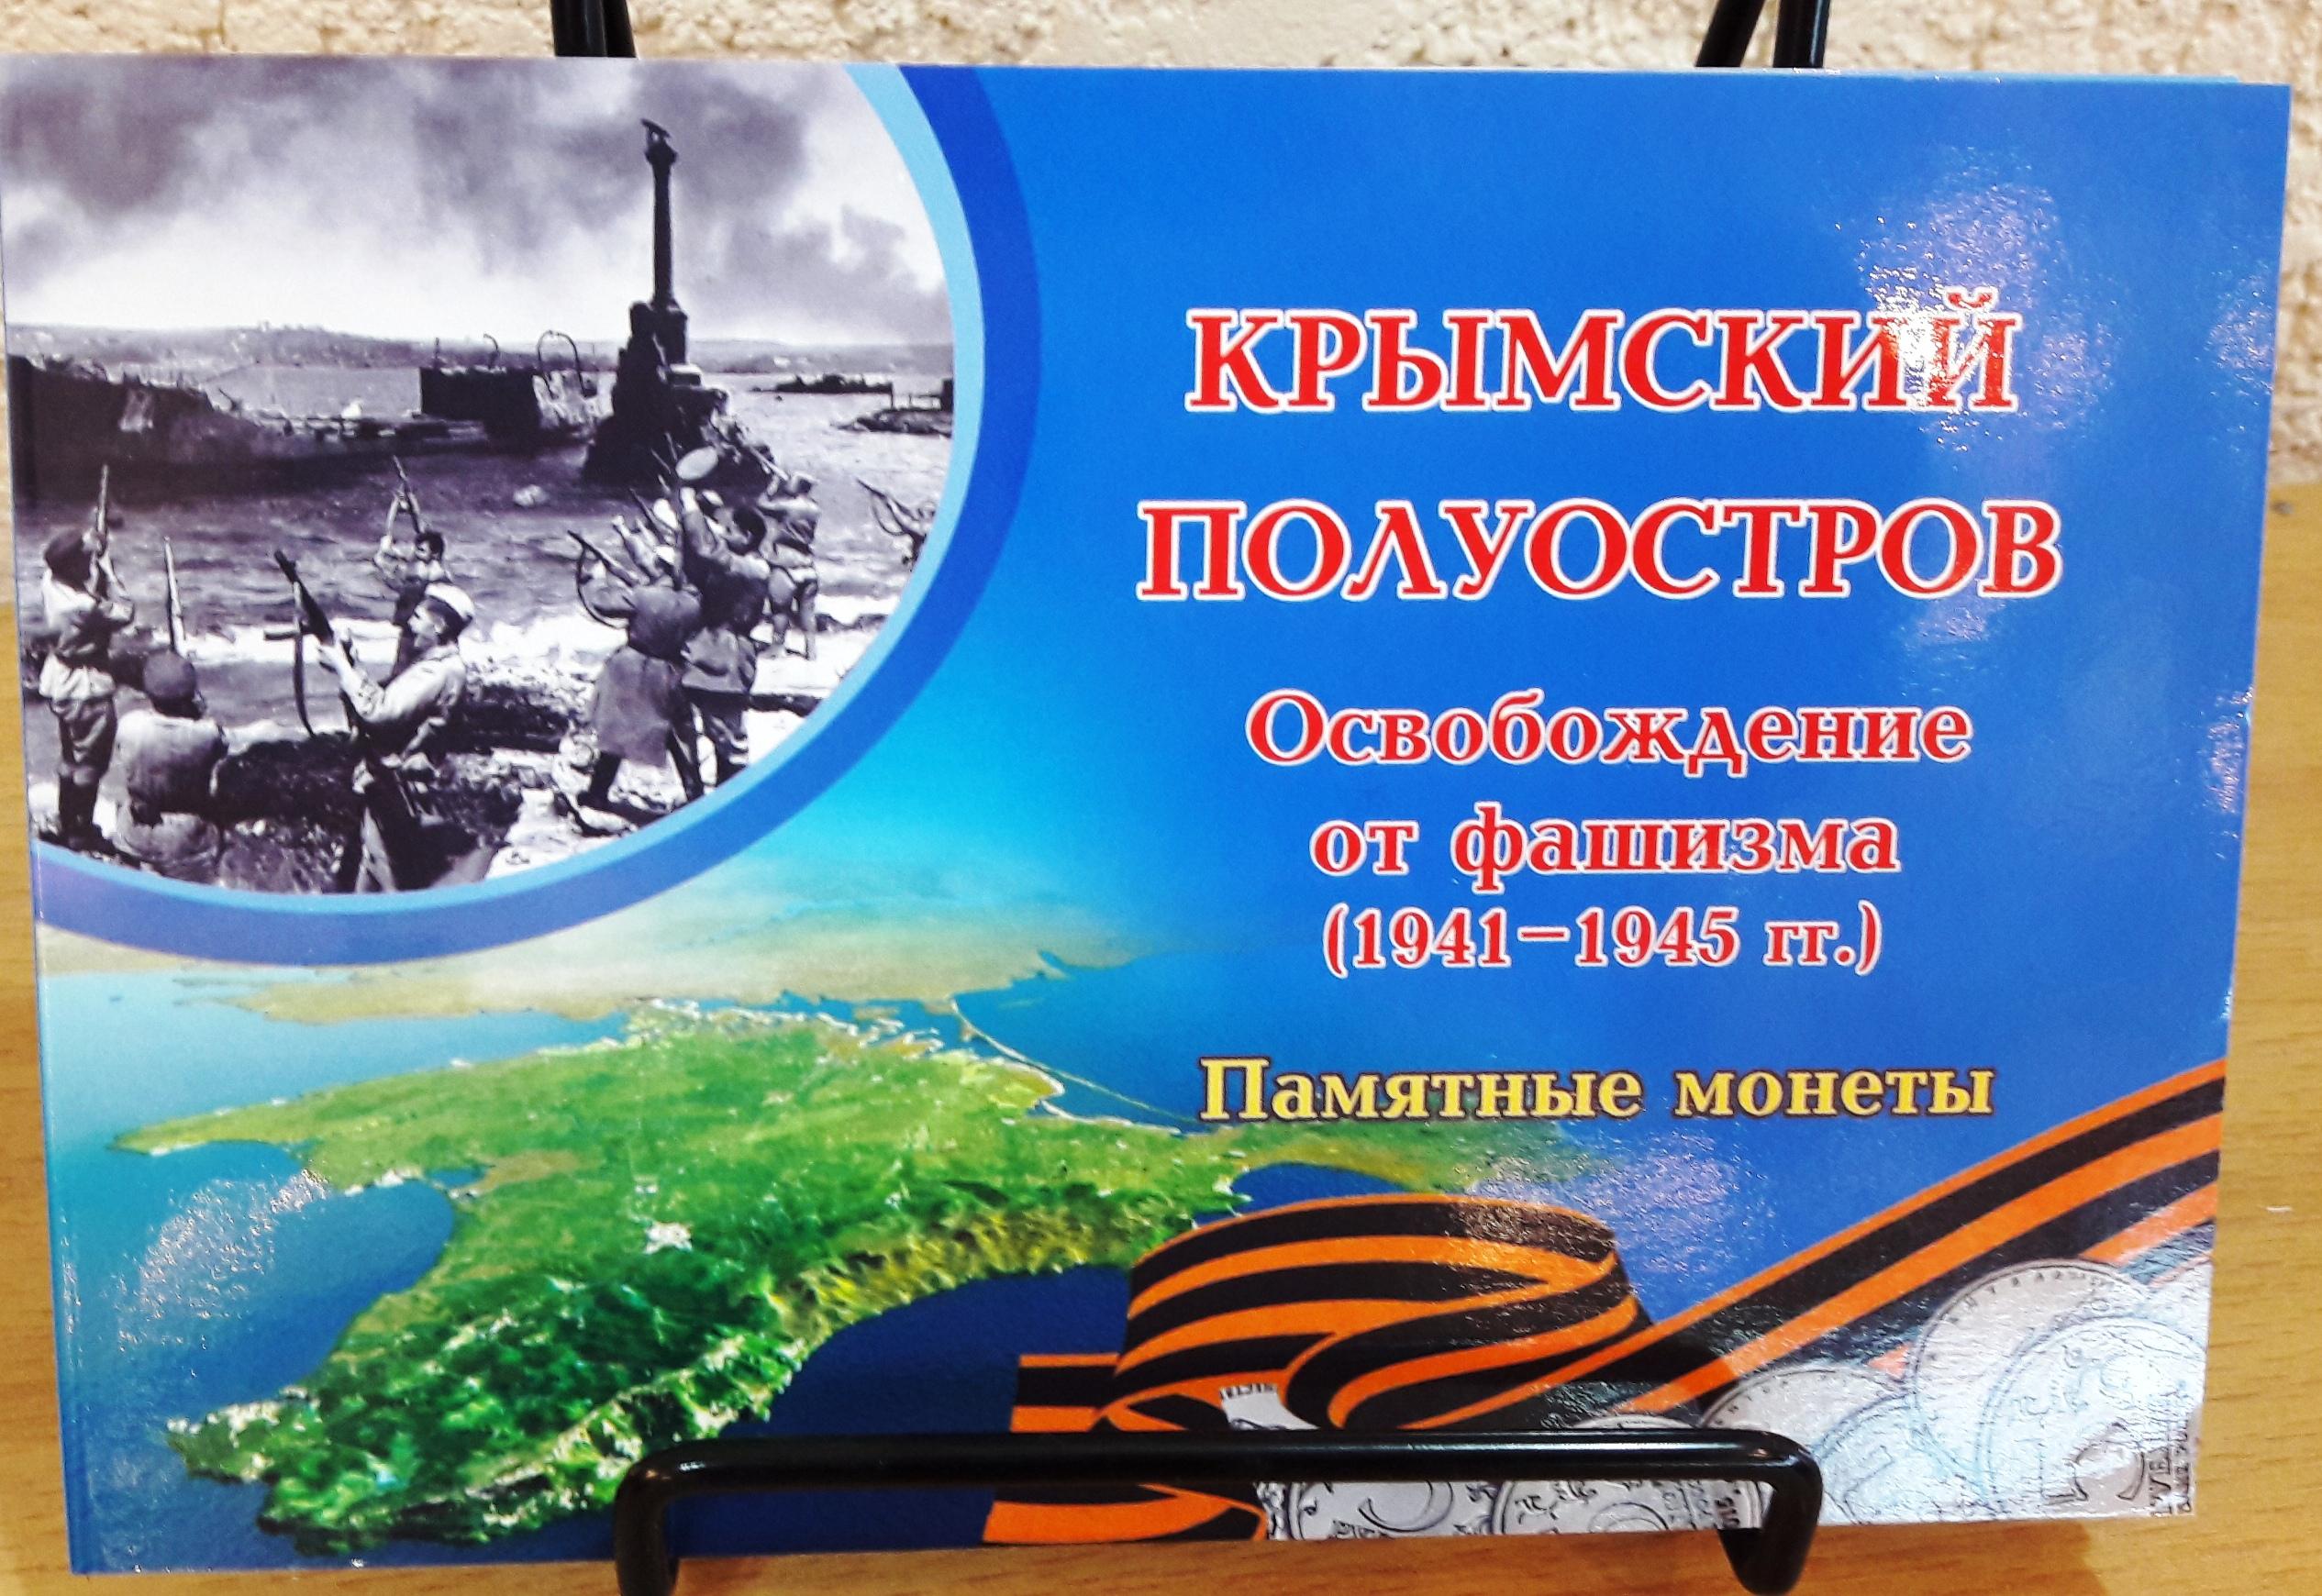 акция набор 250 рублей